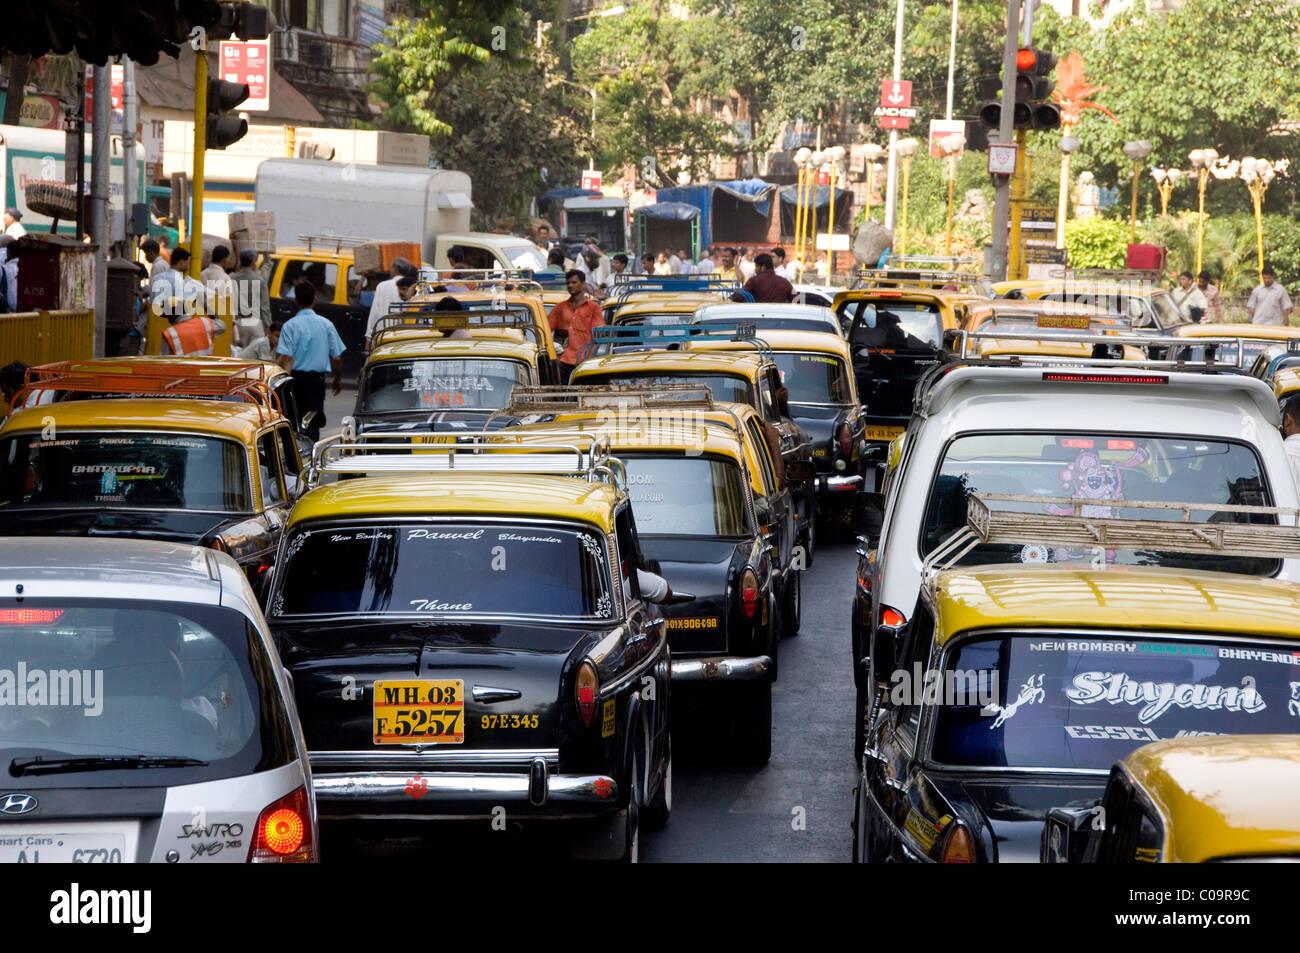 India, state of Maharashtra, Mumbai (aka Bombay). Typical commuter traffic in downtown Mumbai. Stock Photo